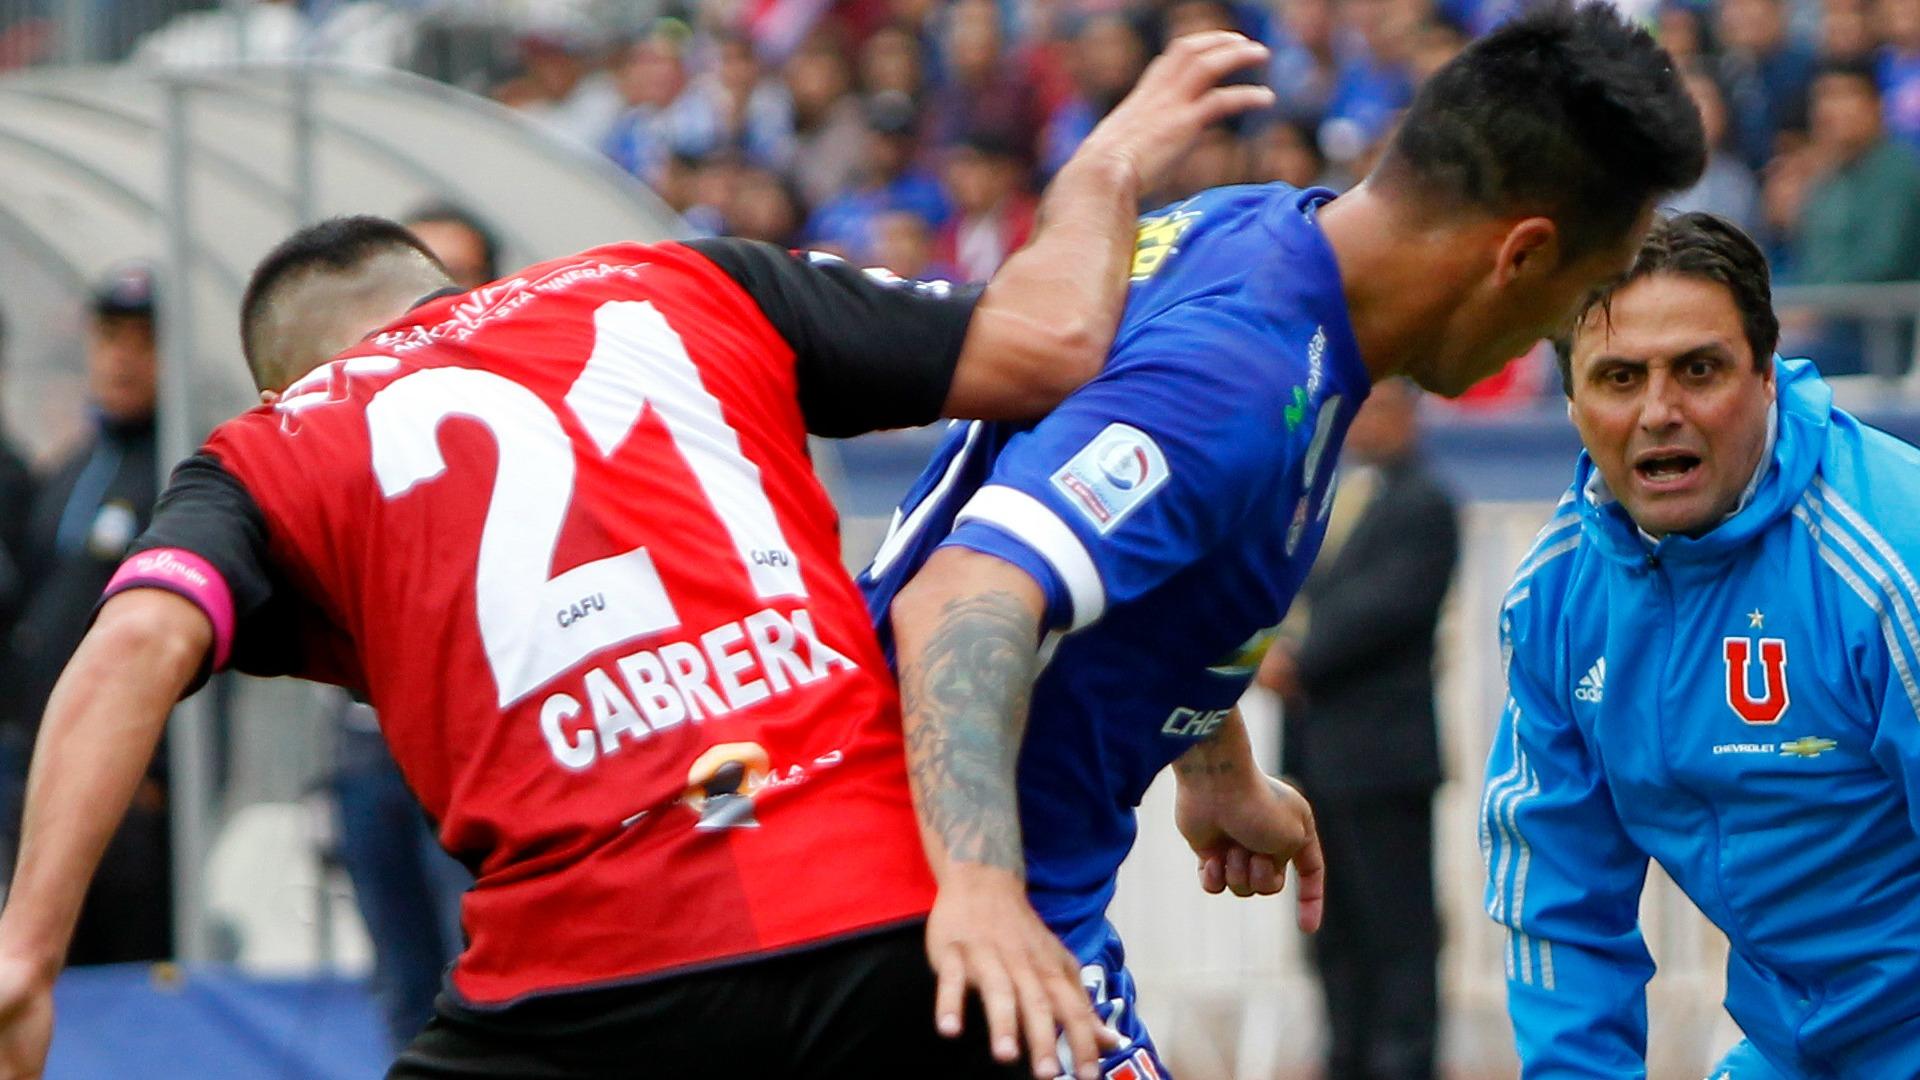 13 puntos para Fabián Monzón por un escalofriante corte en la cara